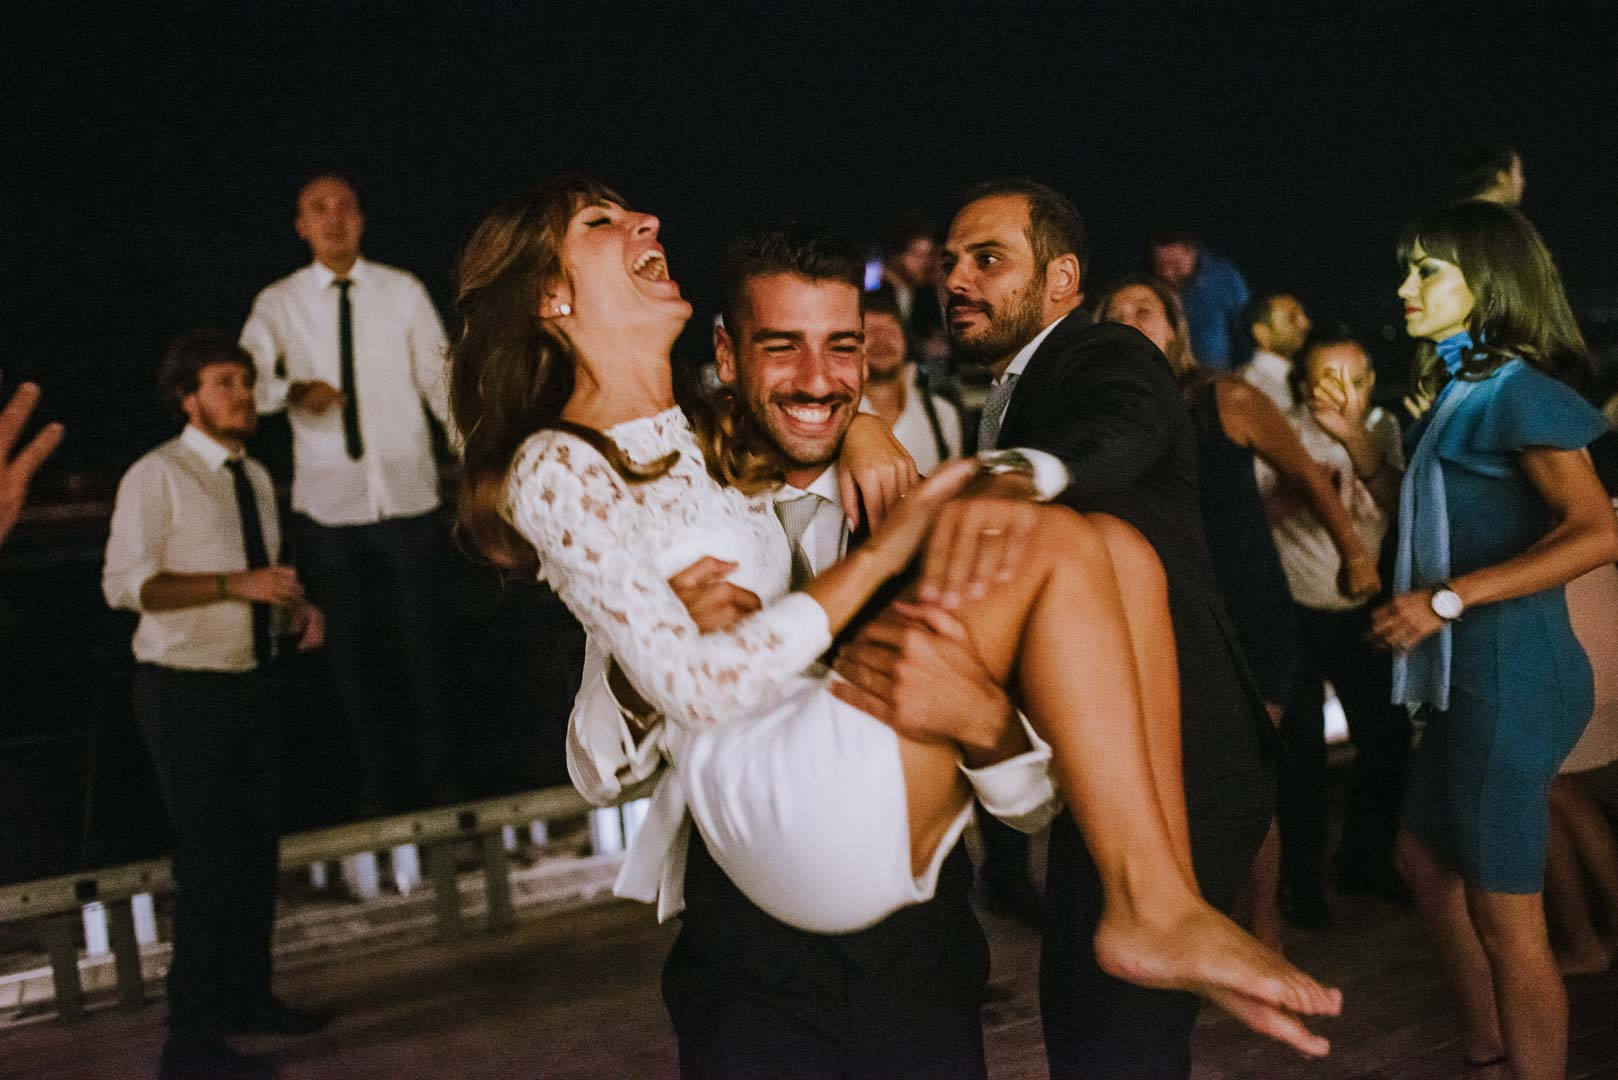 wedding-photographer-destination-fineart-bespoke-reportage-napoli-nabilah-vivianeizzo-spazio46-209